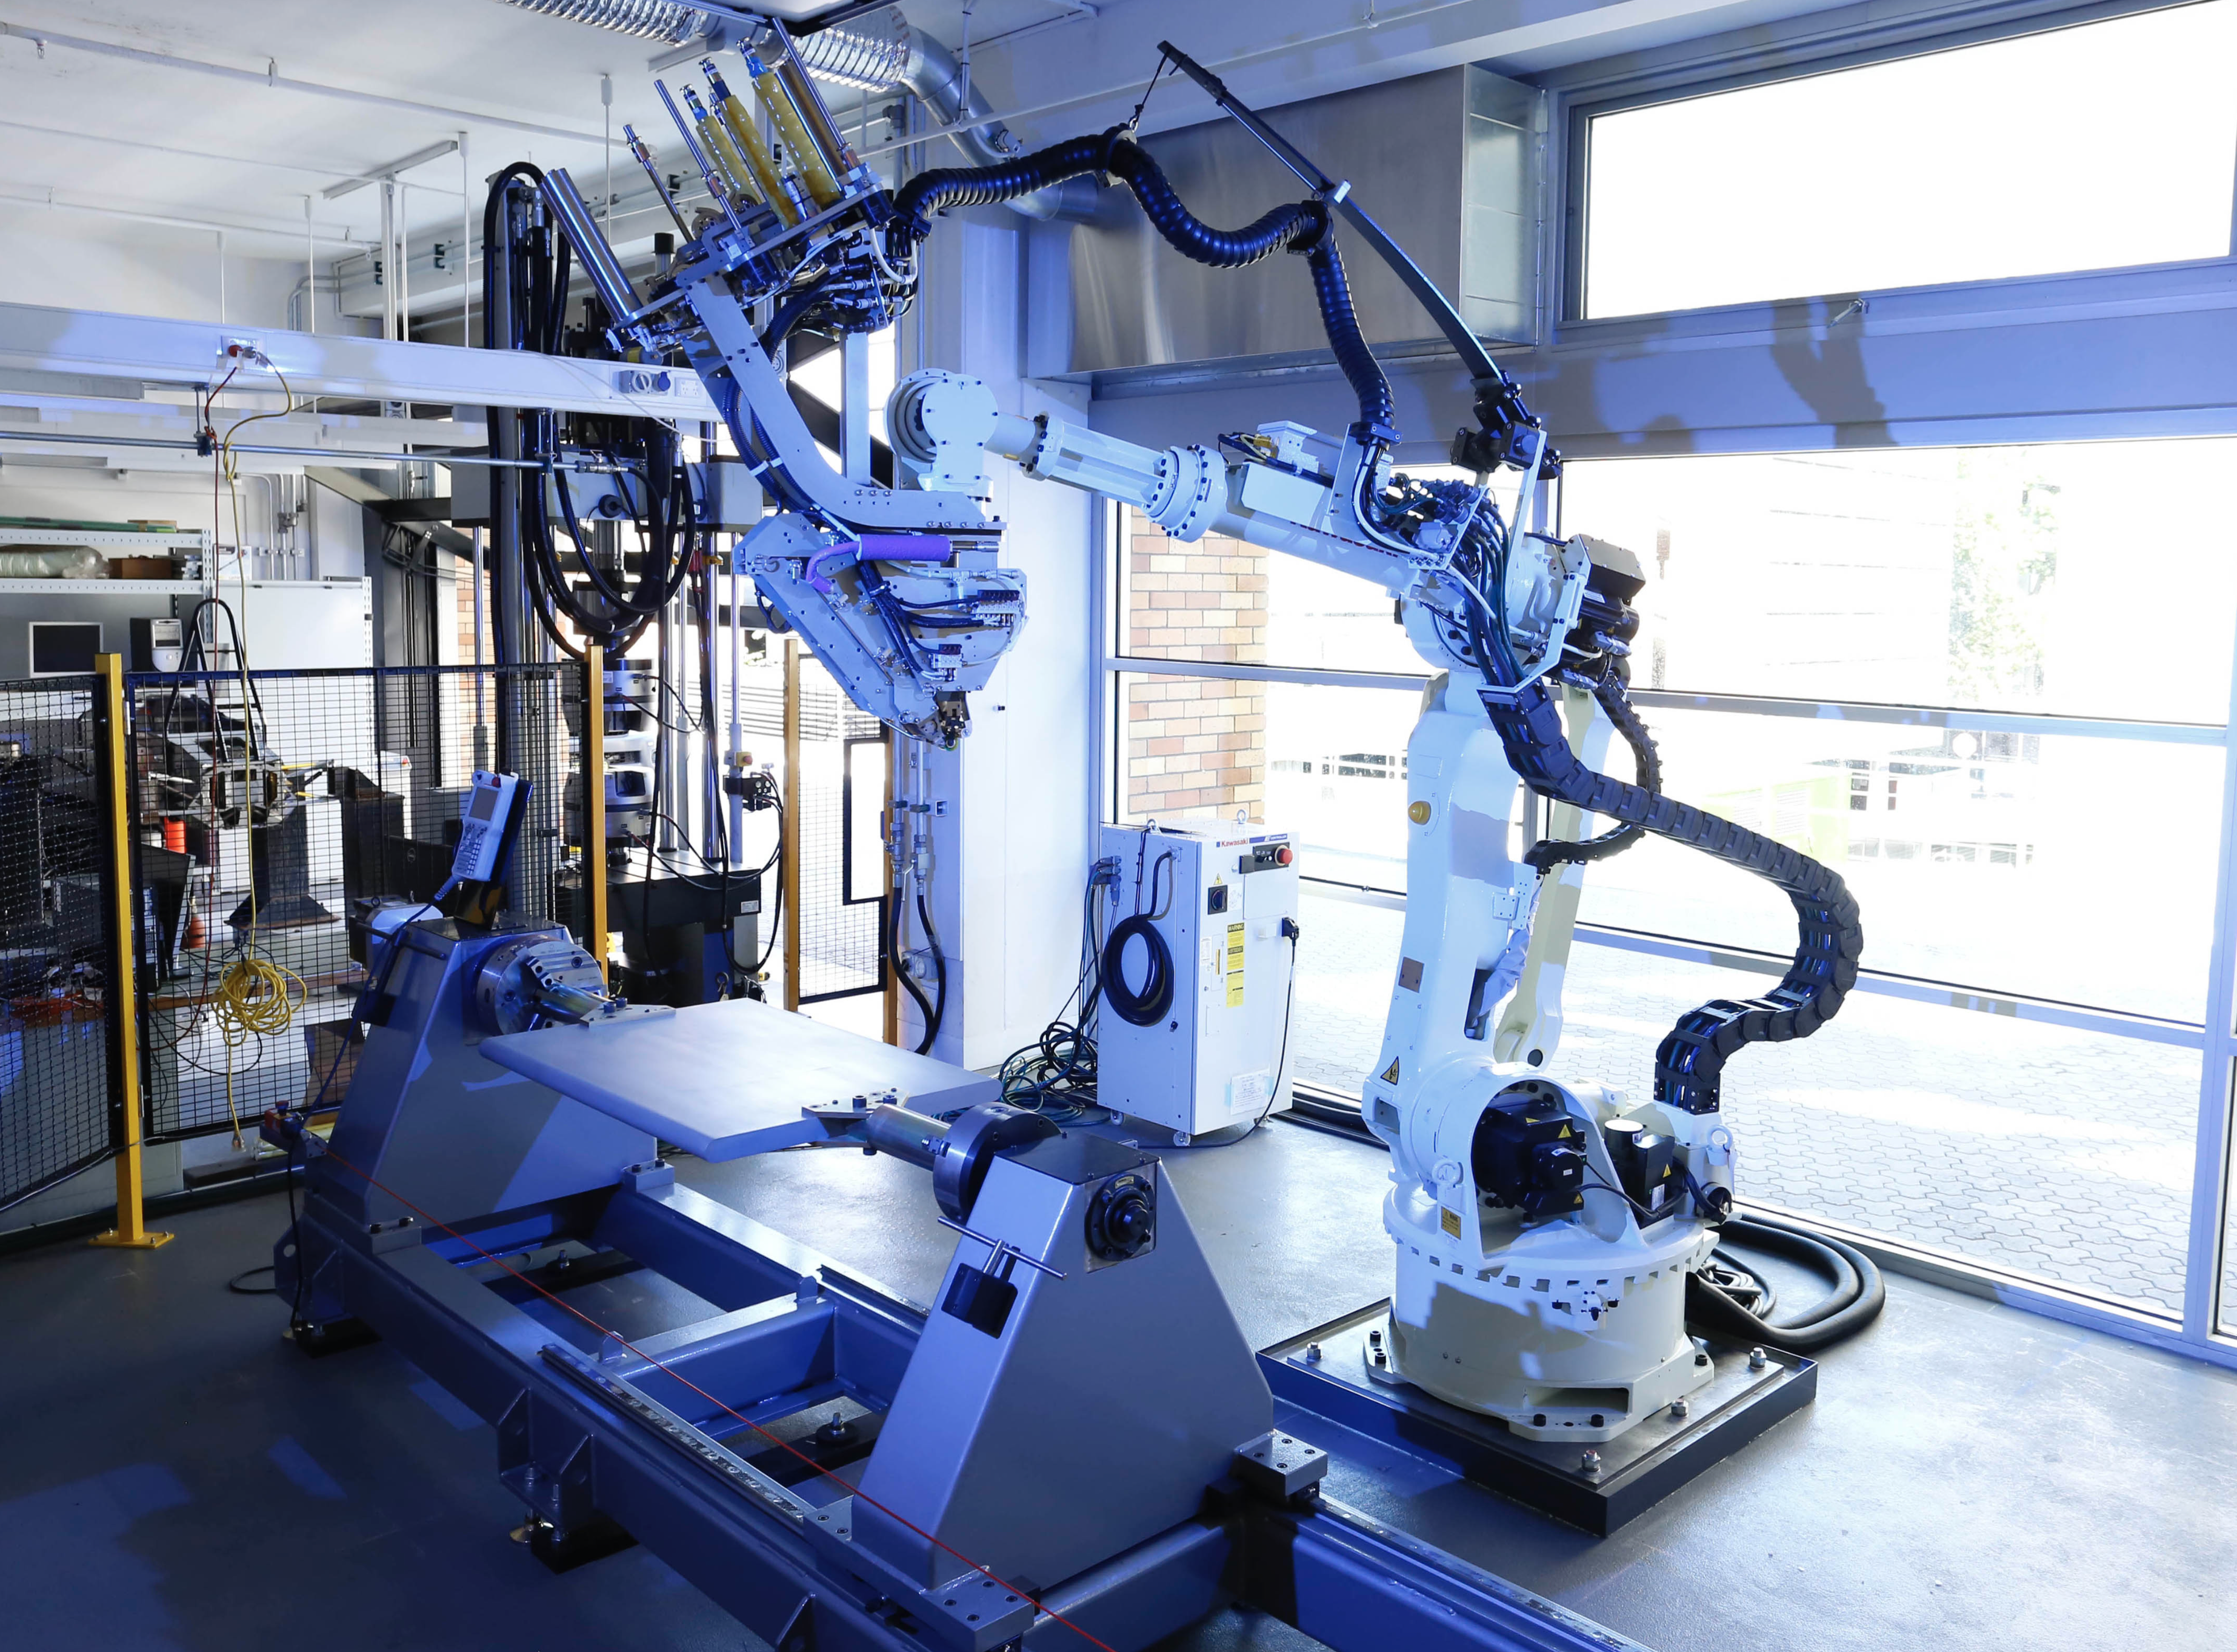 e Automated Fibre Placement (AFP) robot is the centrepiece of UNSW's AMAC laboratory.